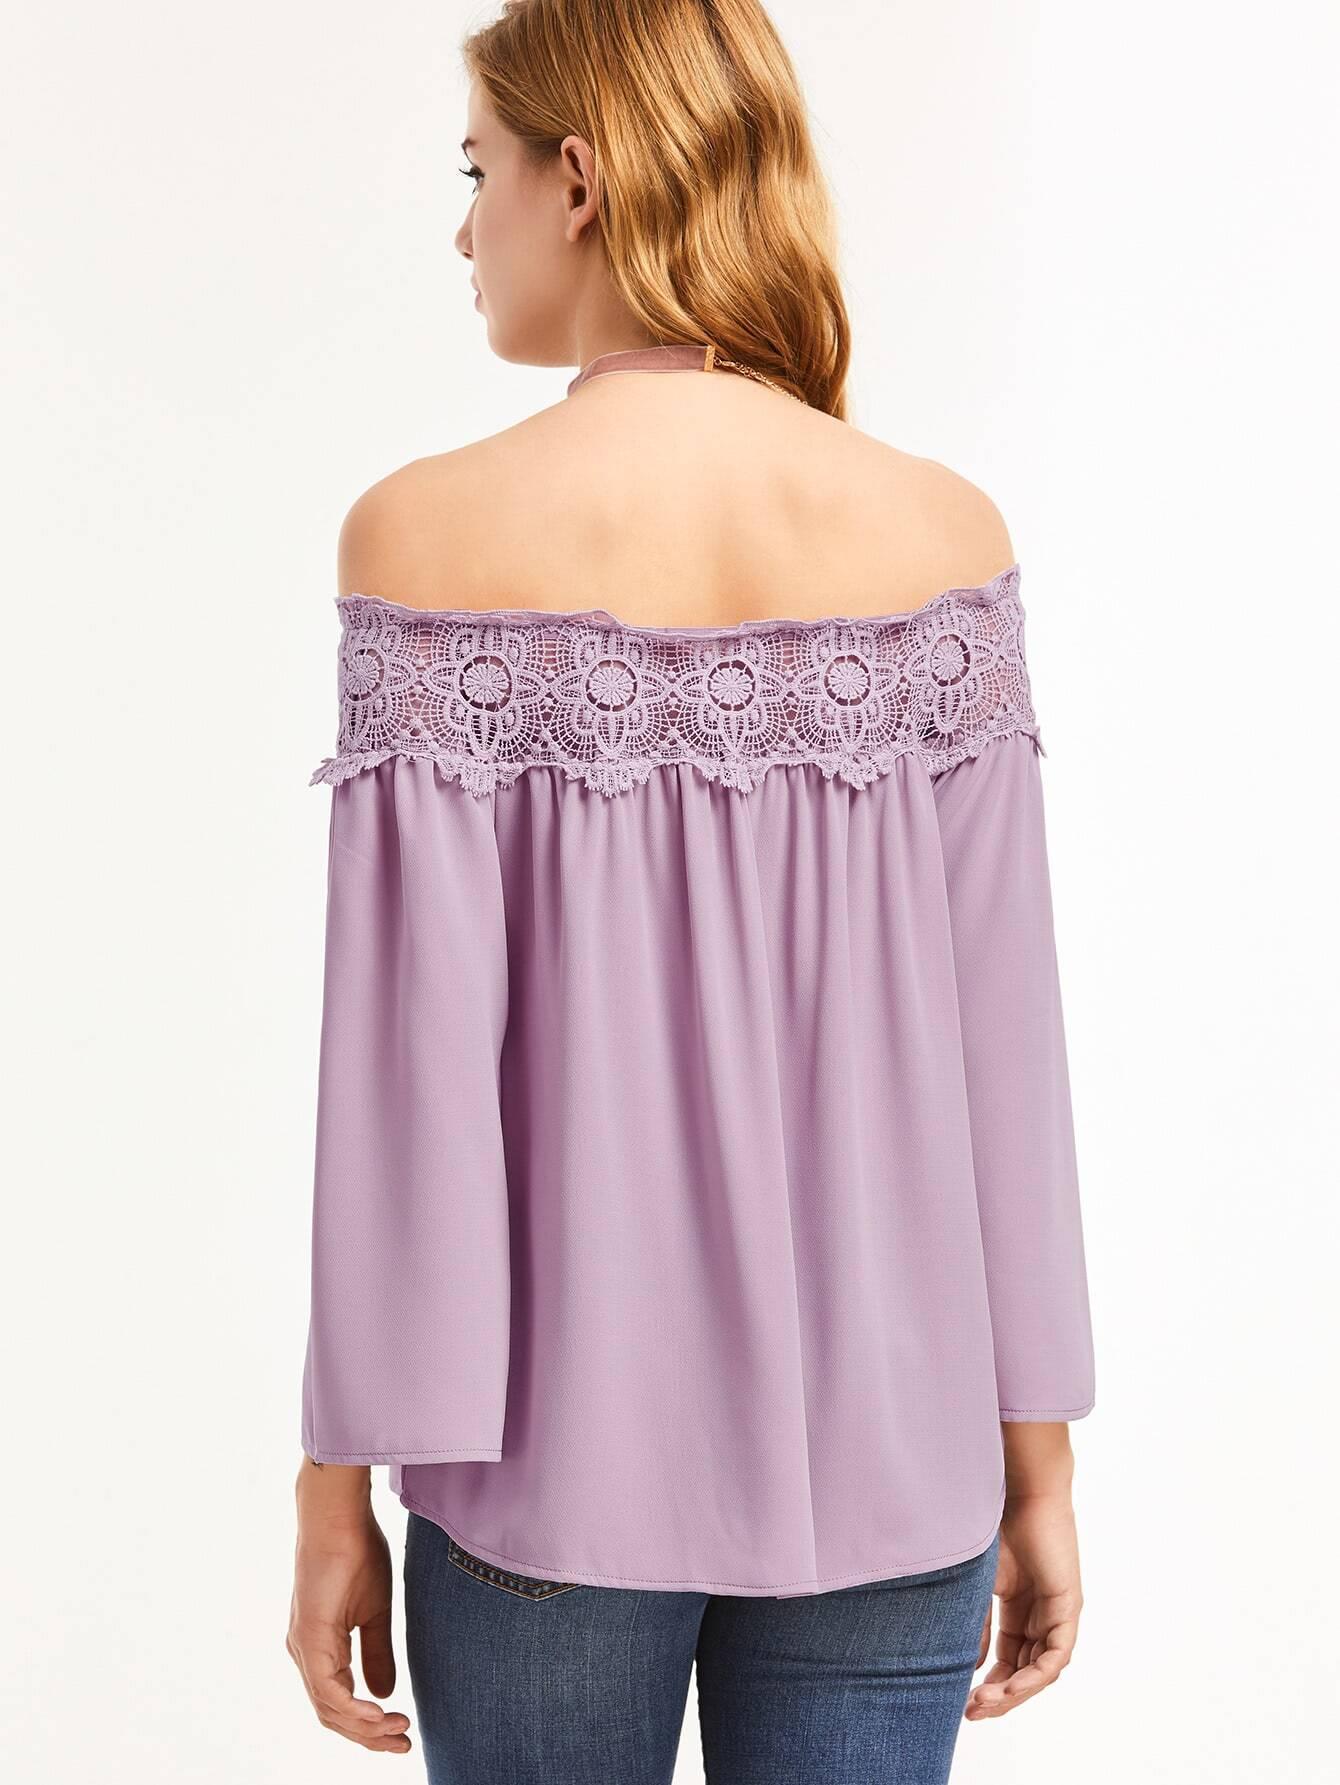 blouse161130451_2